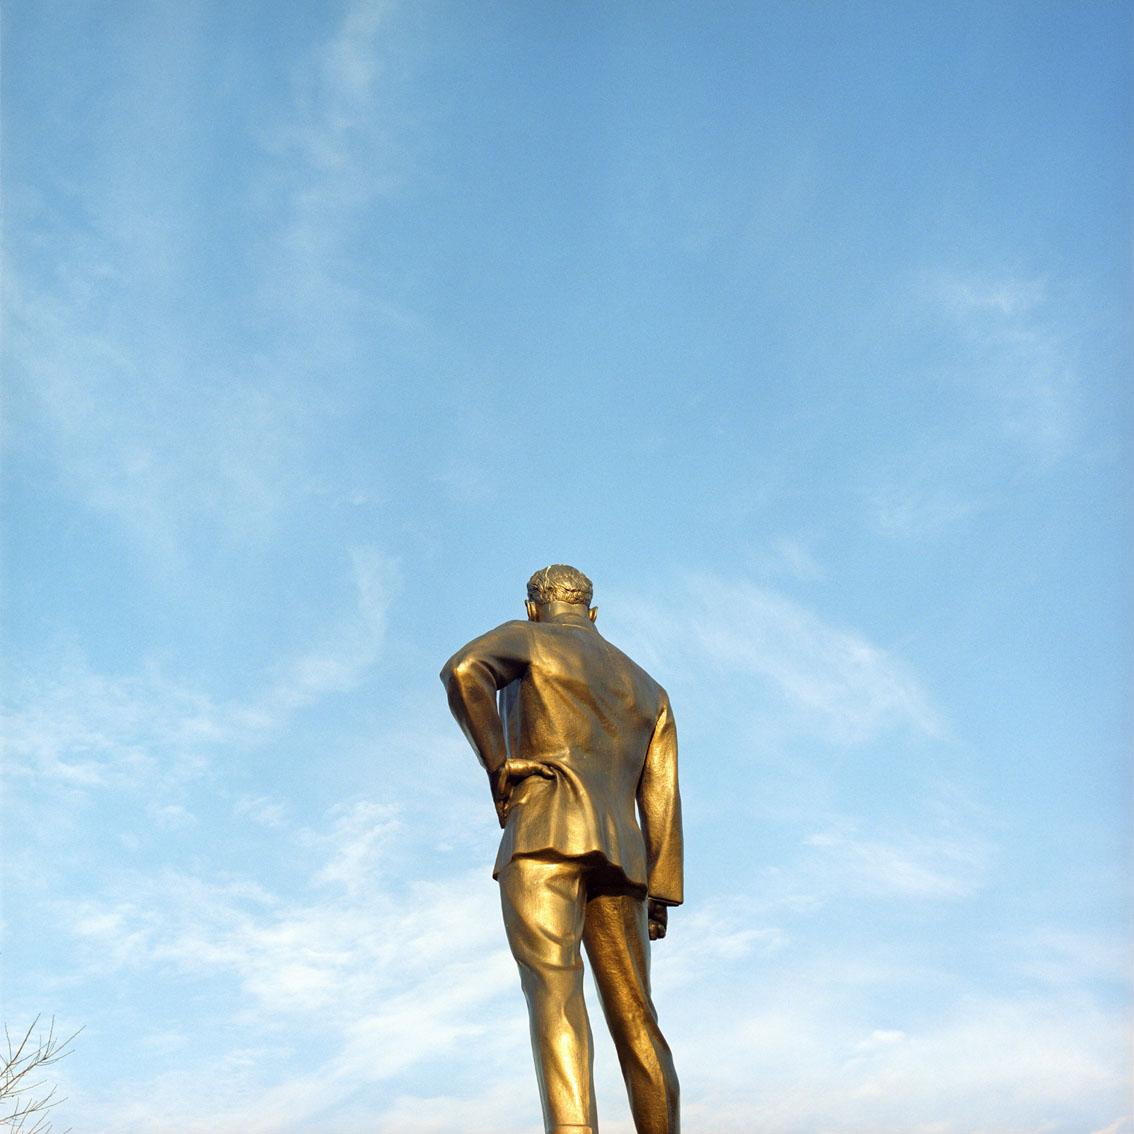 Statue of Ataturk in Istanbul, Turkey